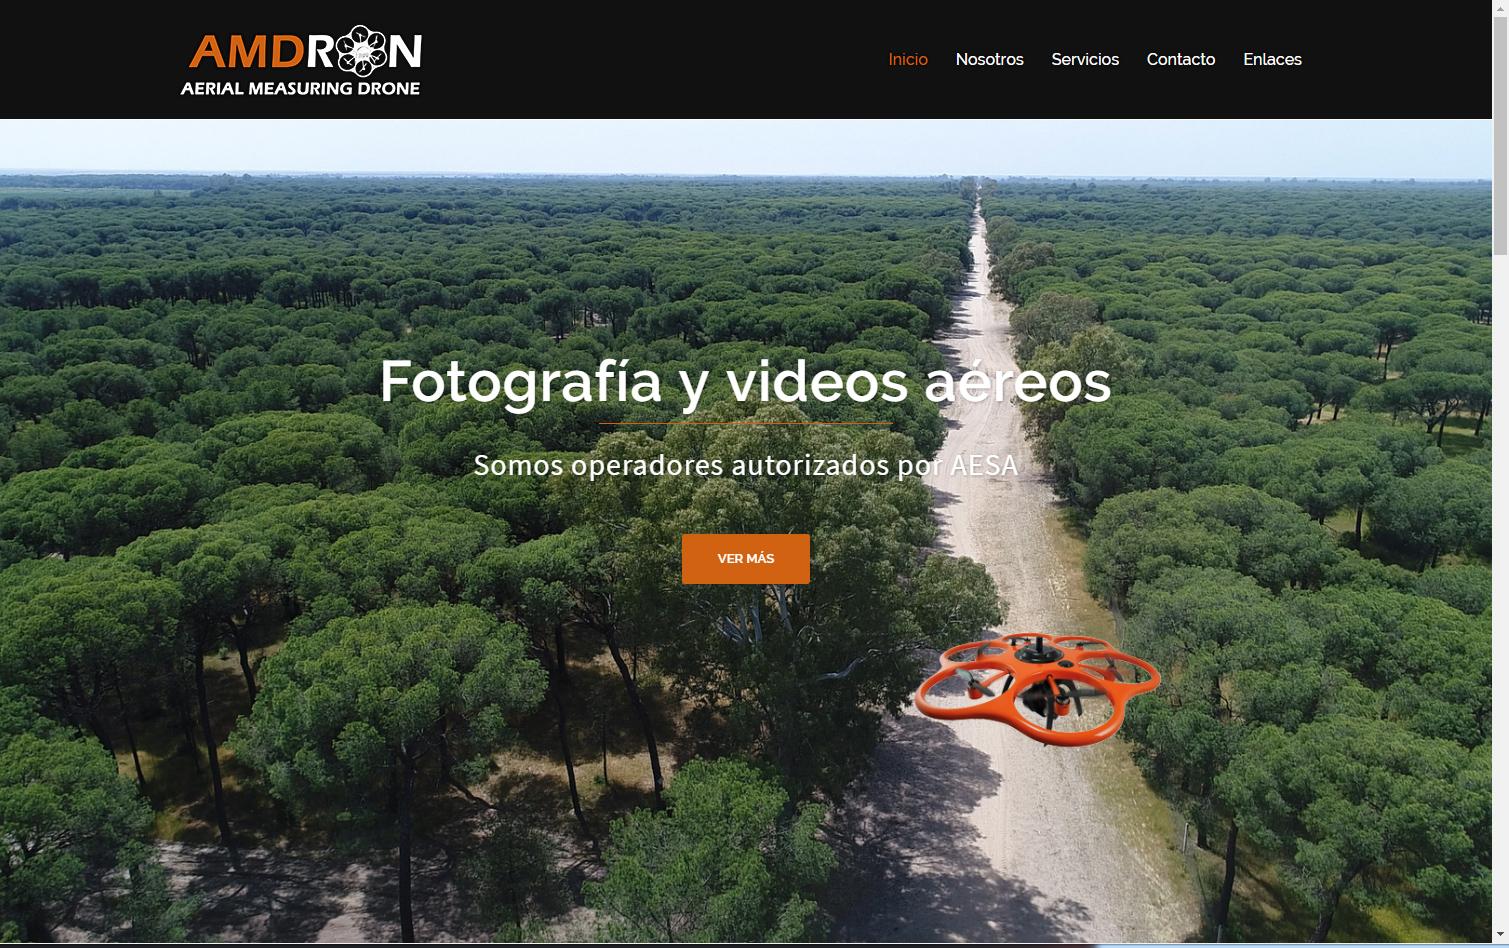 Imagen 1 de 4 - AMDRON